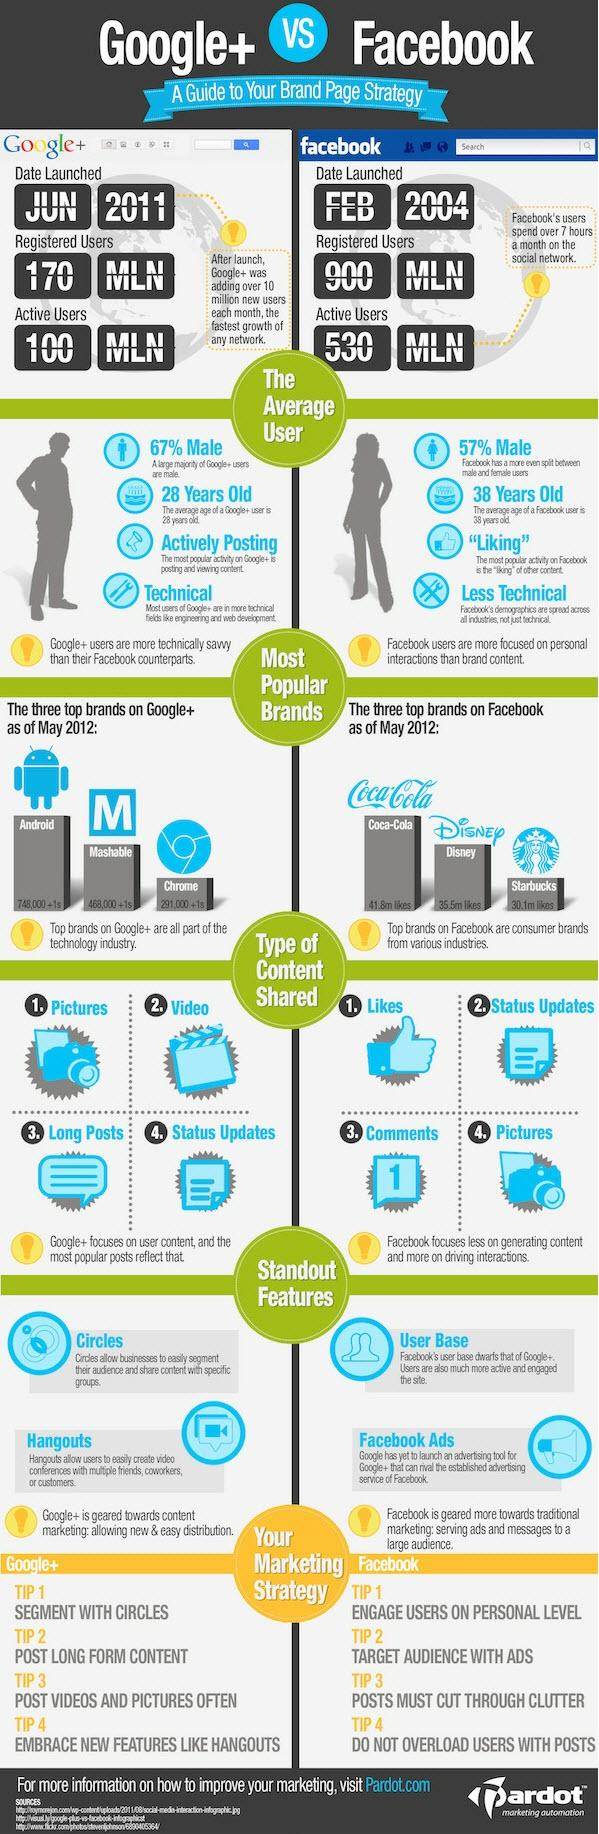 Google+ vs Facebook - Infographic